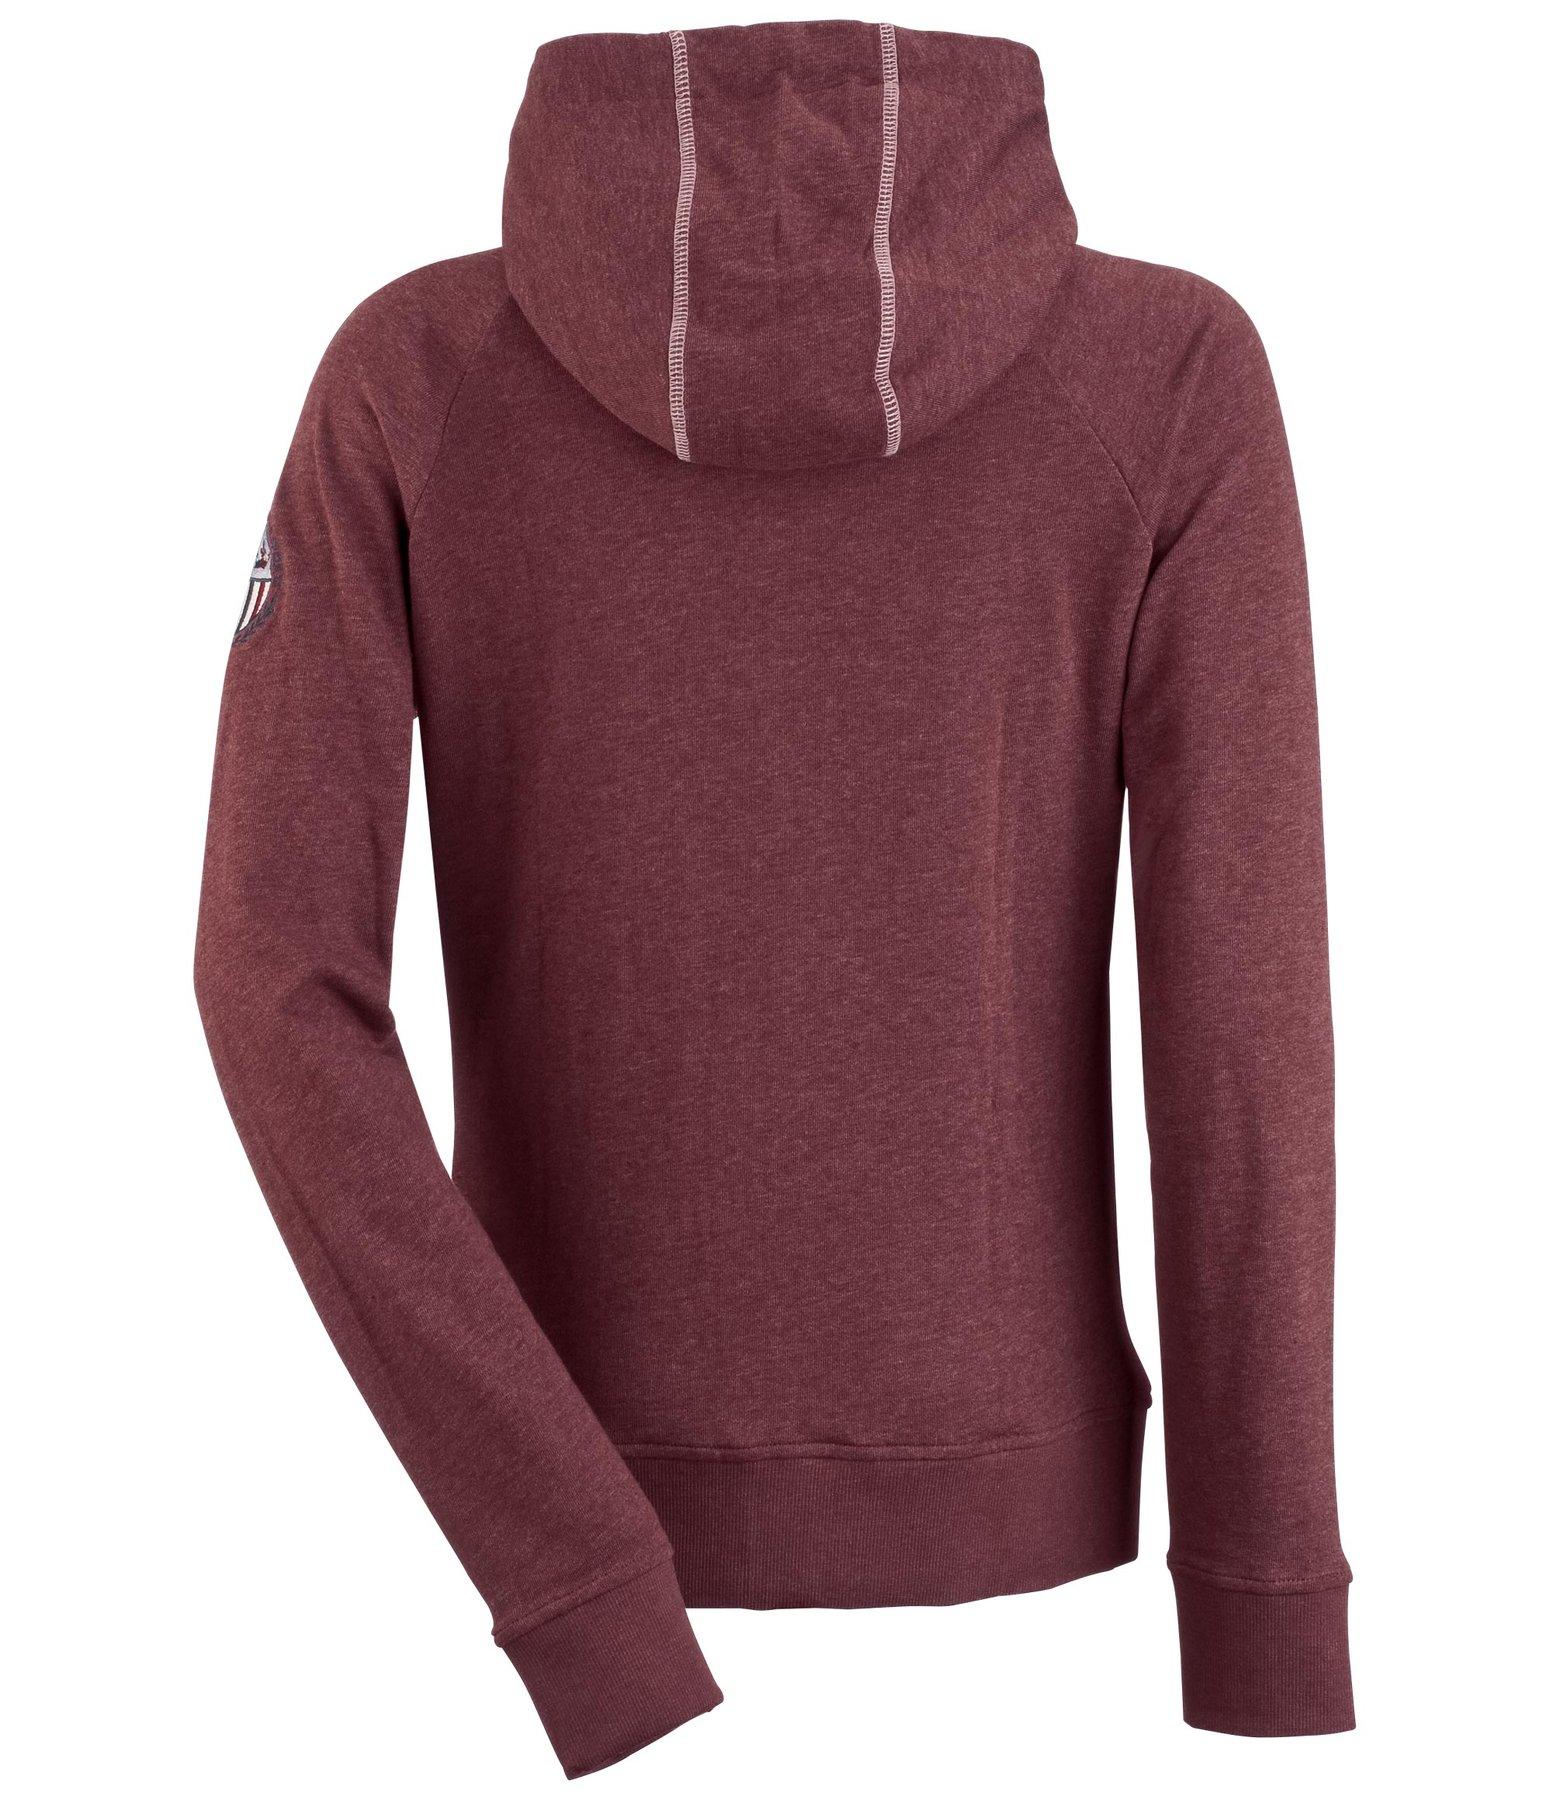 hooded sweat jacket ida sweat jackets kramer equestrian. Black Bedroom Furniture Sets. Home Design Ideas